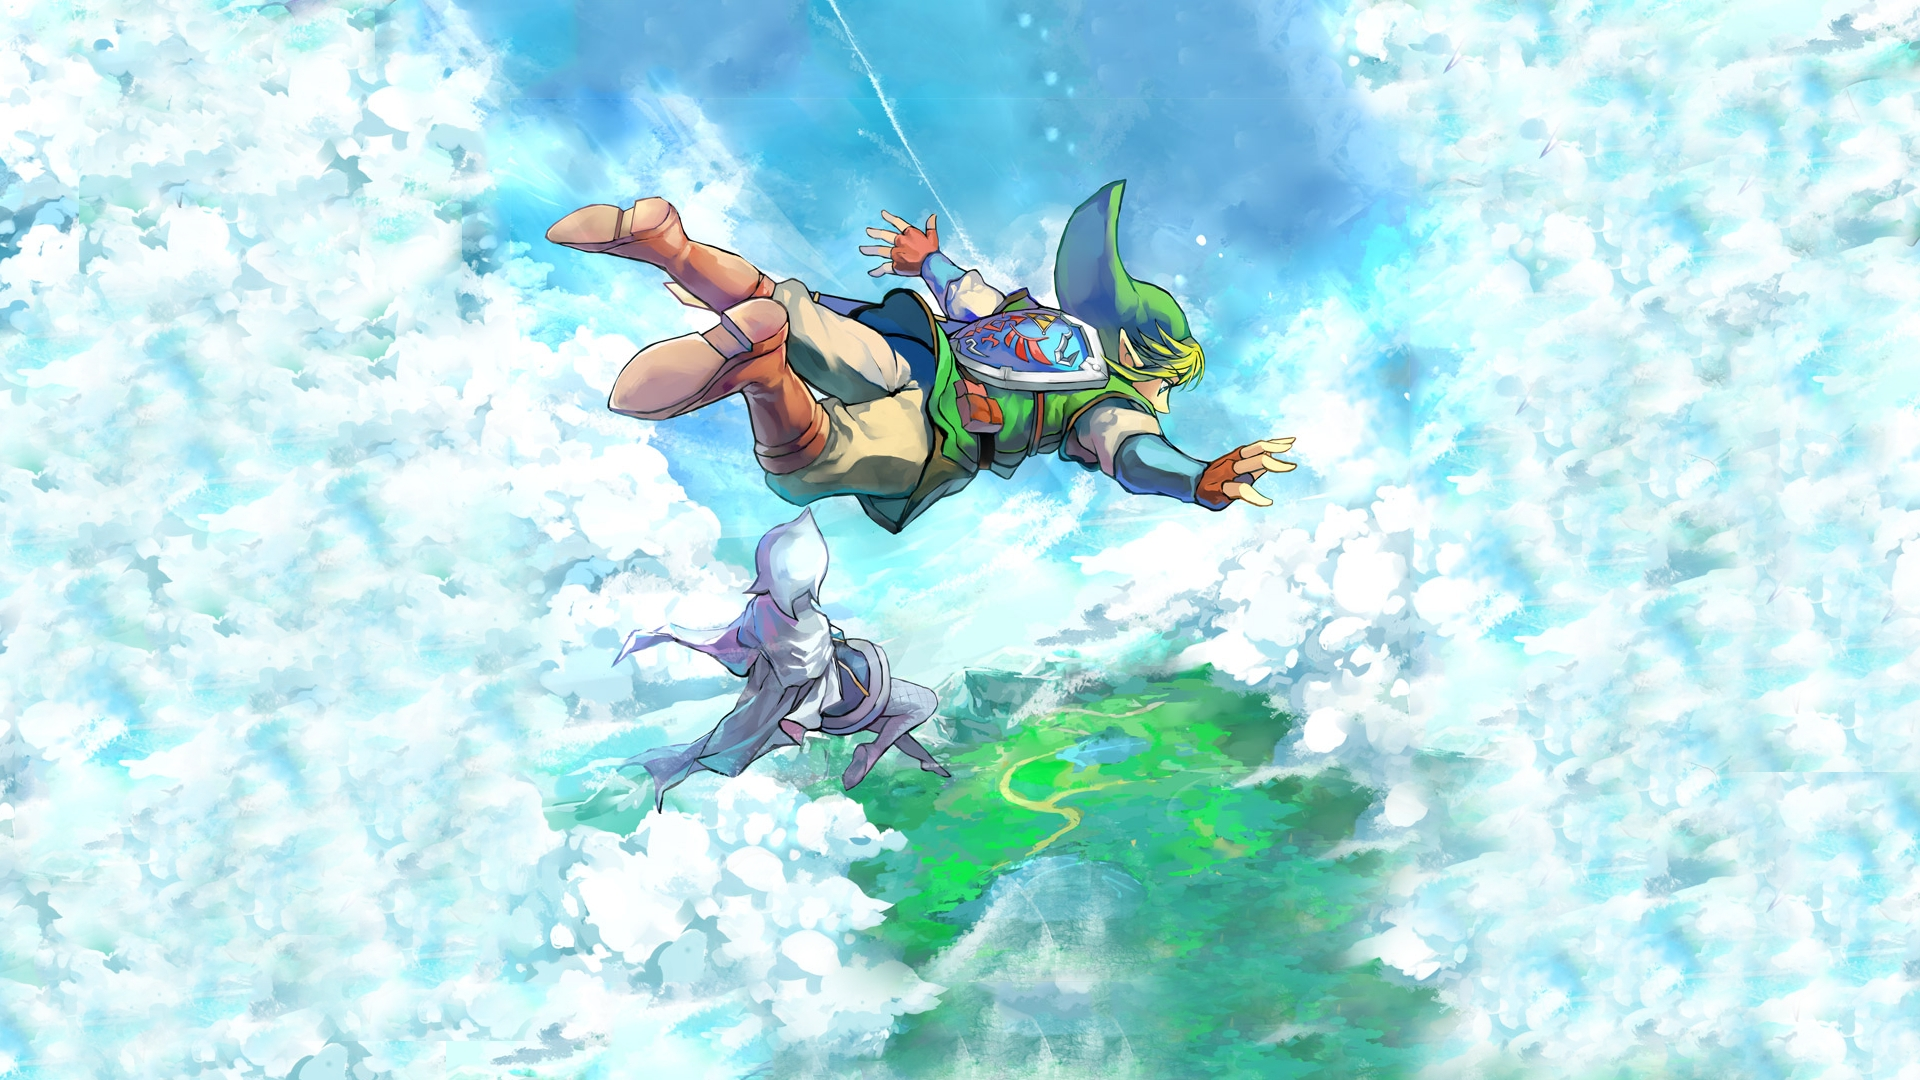 the legend of zelda: skyward sword full hd fond d'écran and arrière